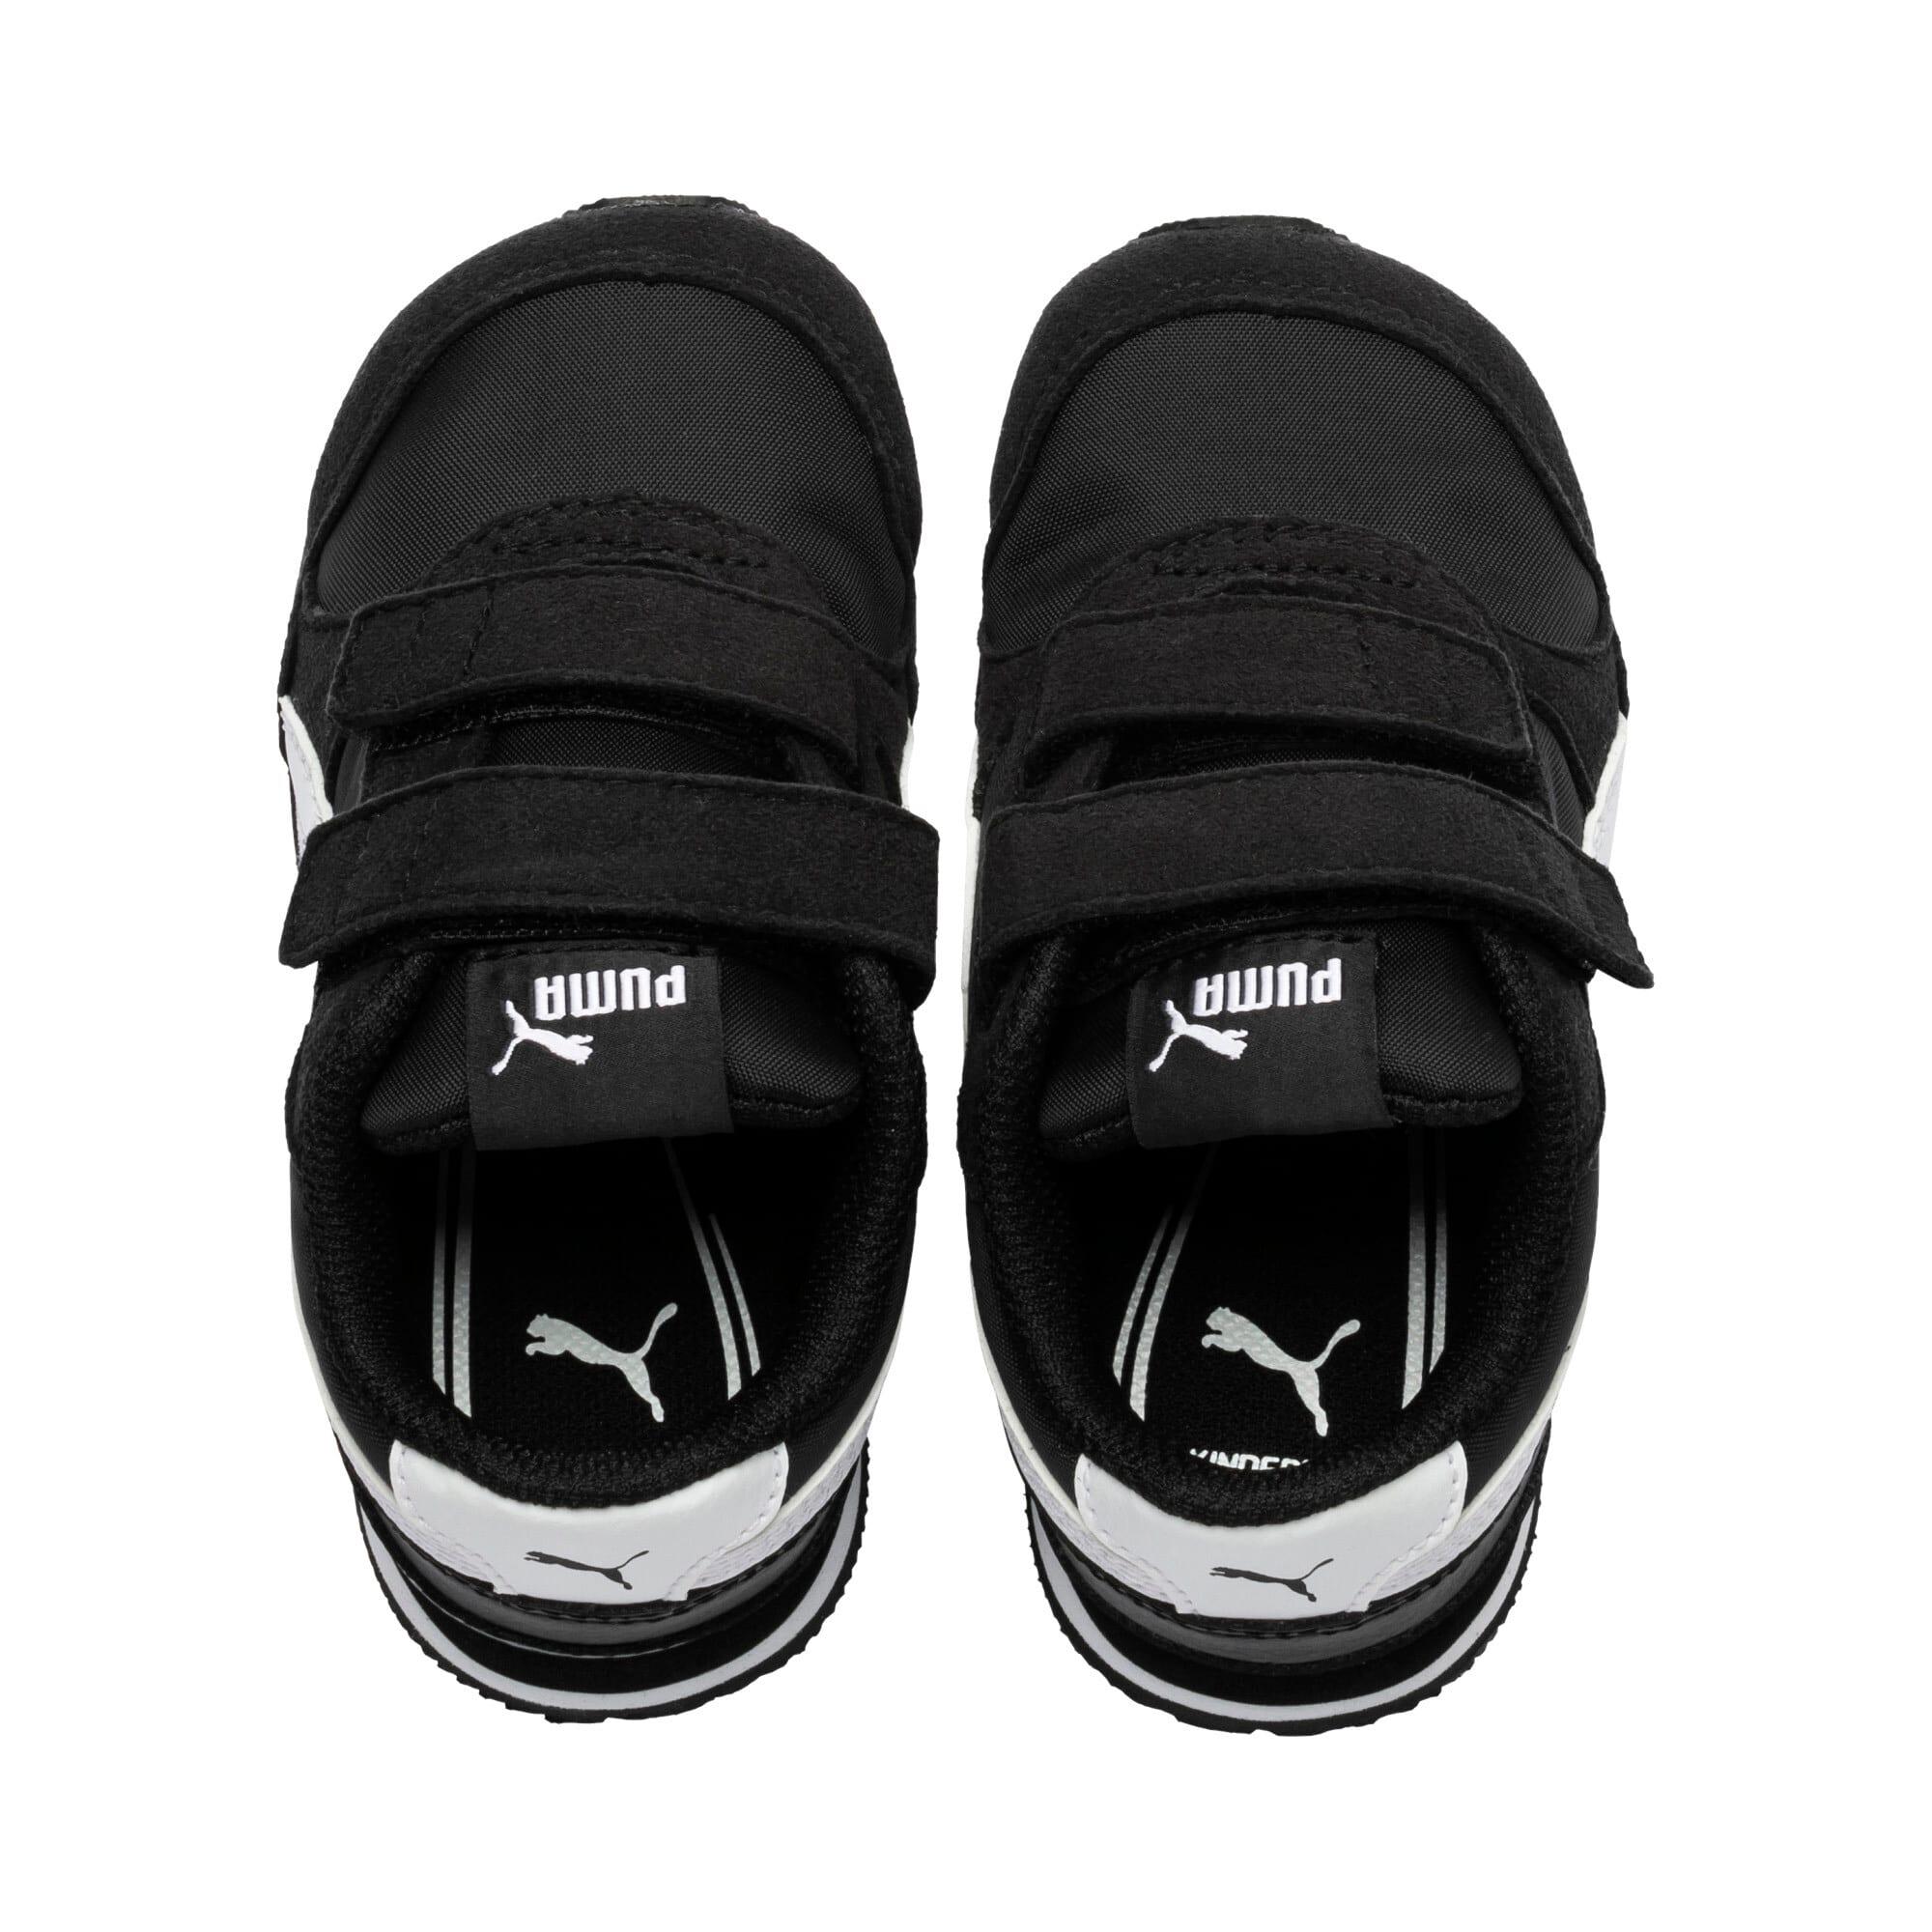 Thumbnail 6 of ST Runner v2 Little Kids' Shoes, Puma Black-Puma White, medium